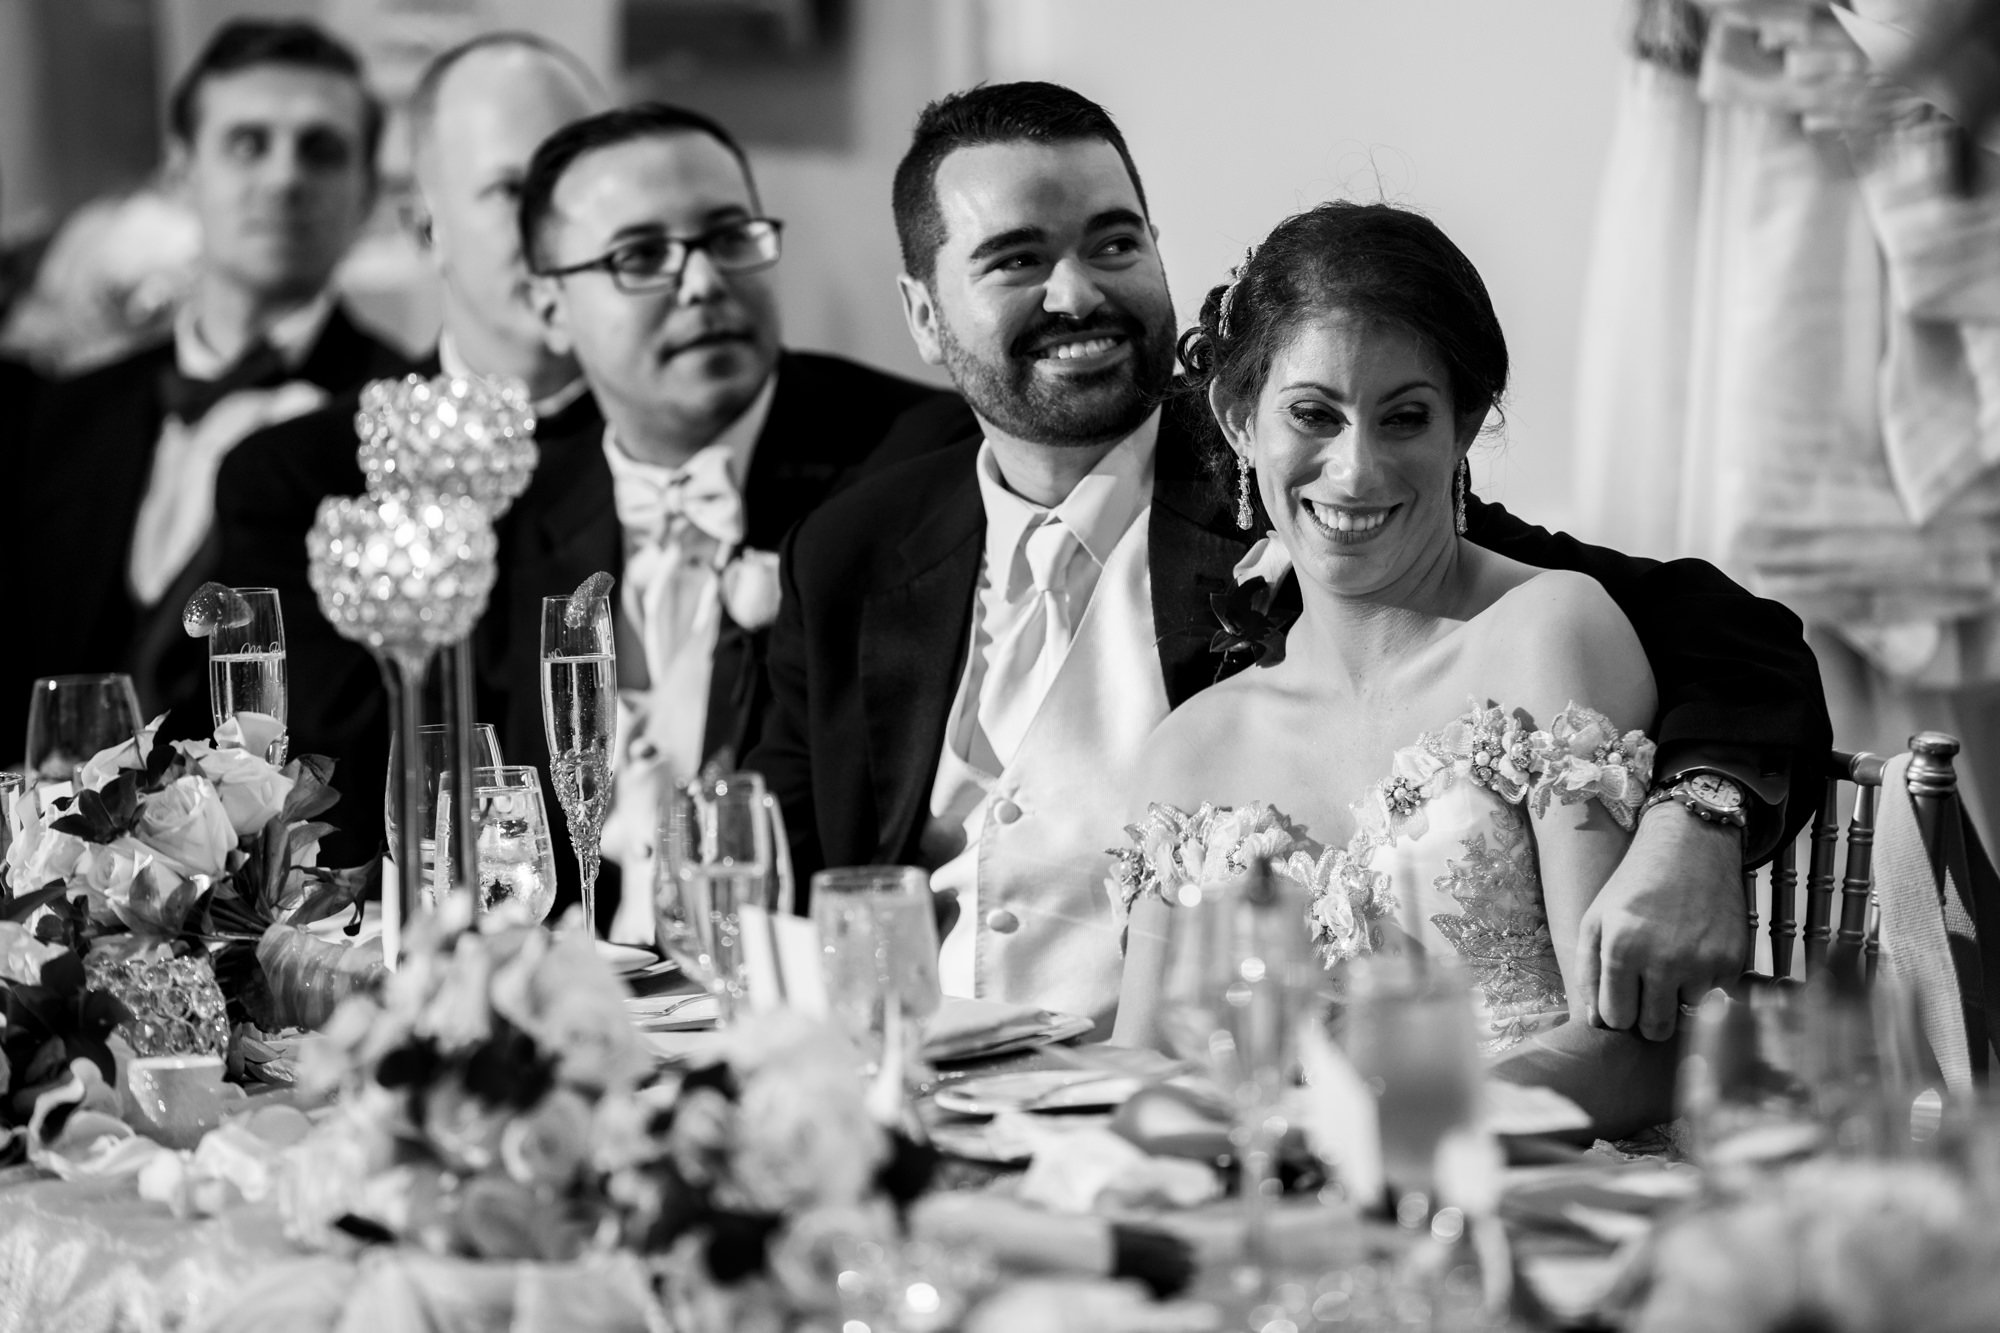 Benvenuto_Wedding_catholic_Florida_Bride-Groom-115.jpg